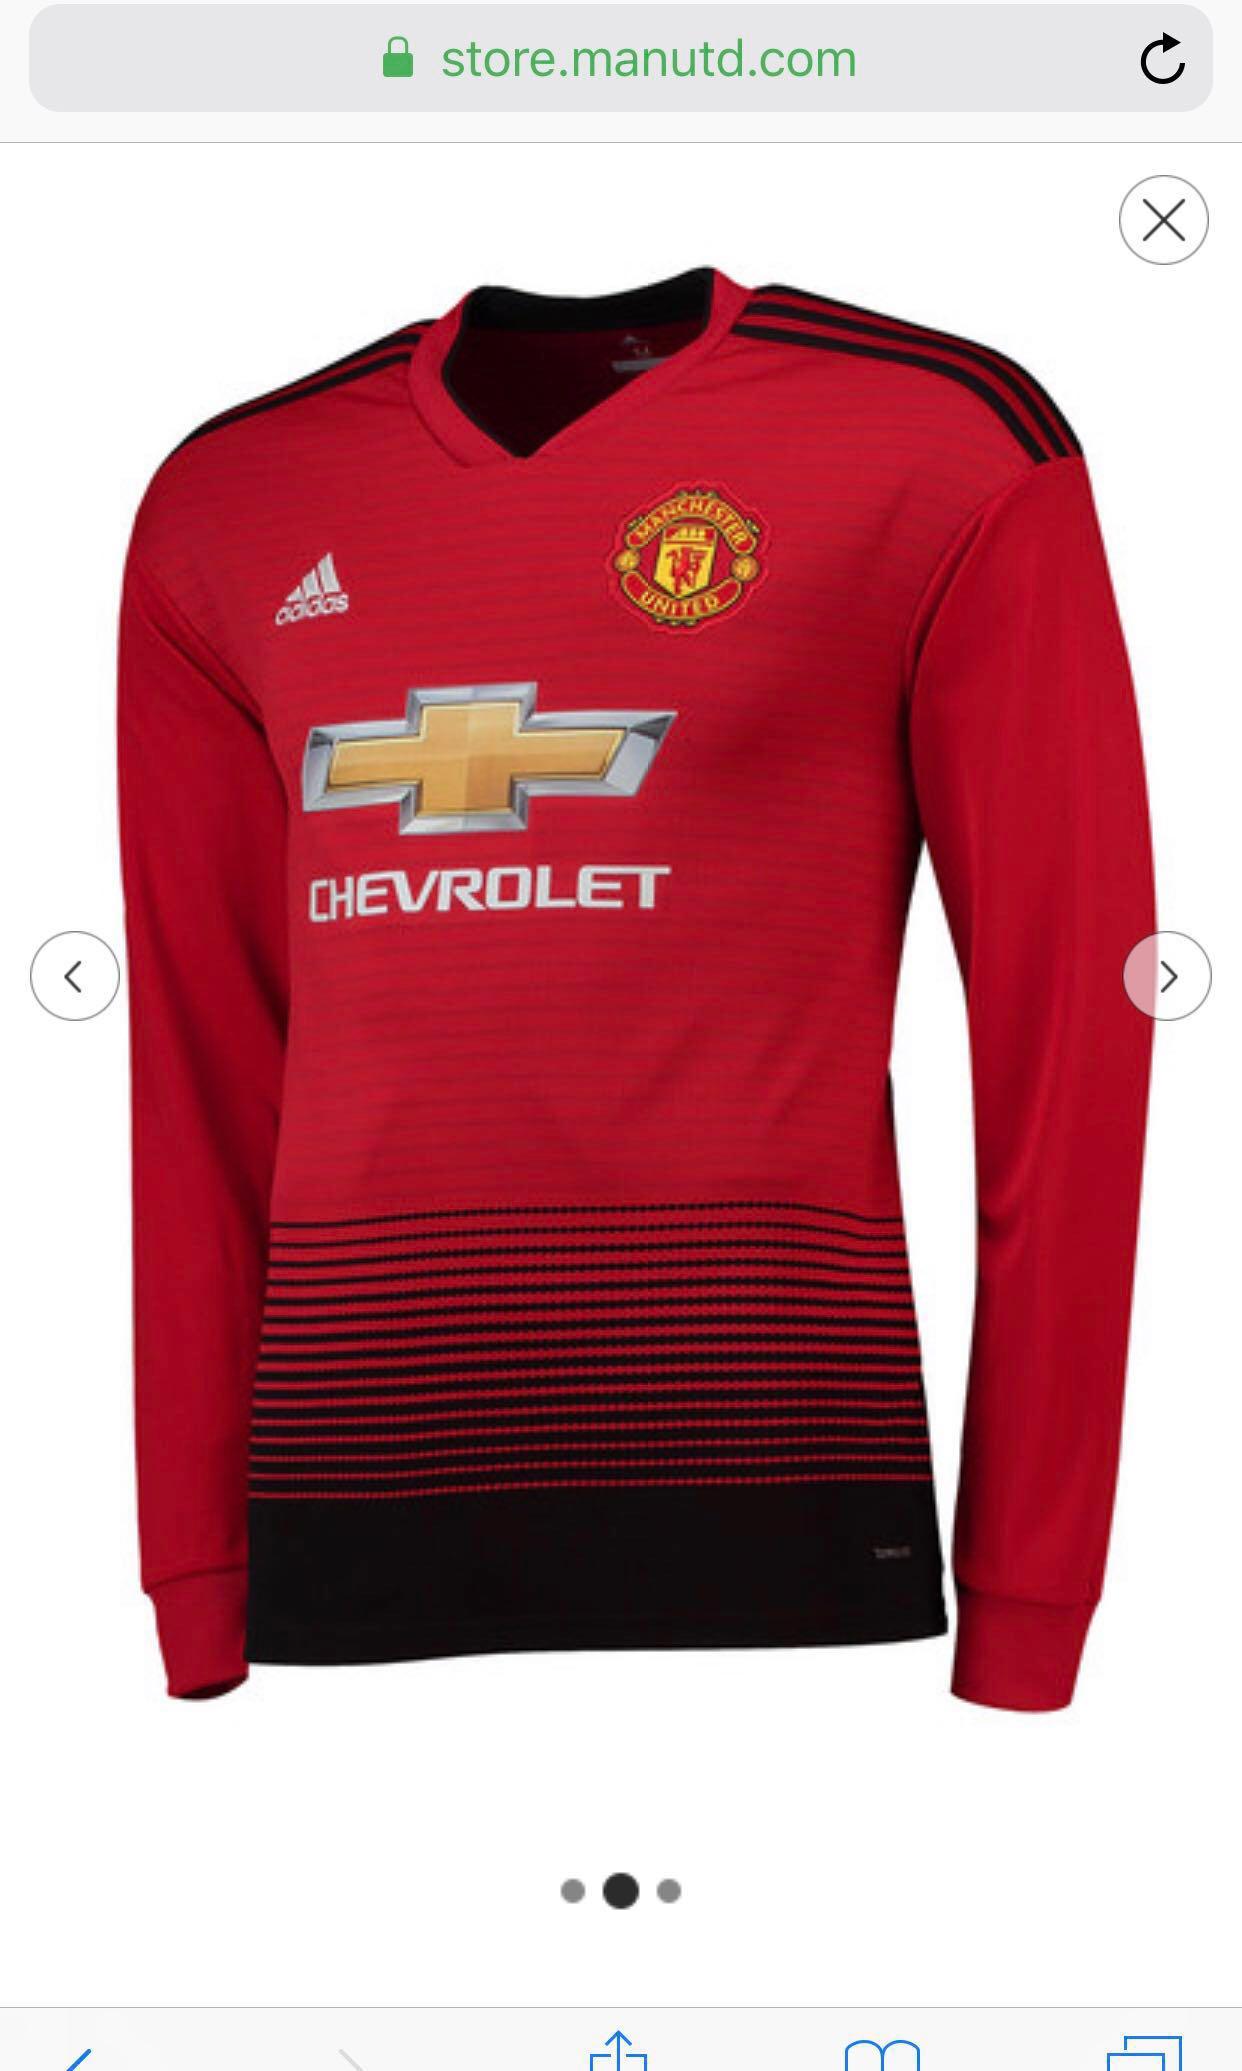 62178b14c Manchester United Home Shirt 2018-19 - Long Sleeve (XXXL), Sports ...